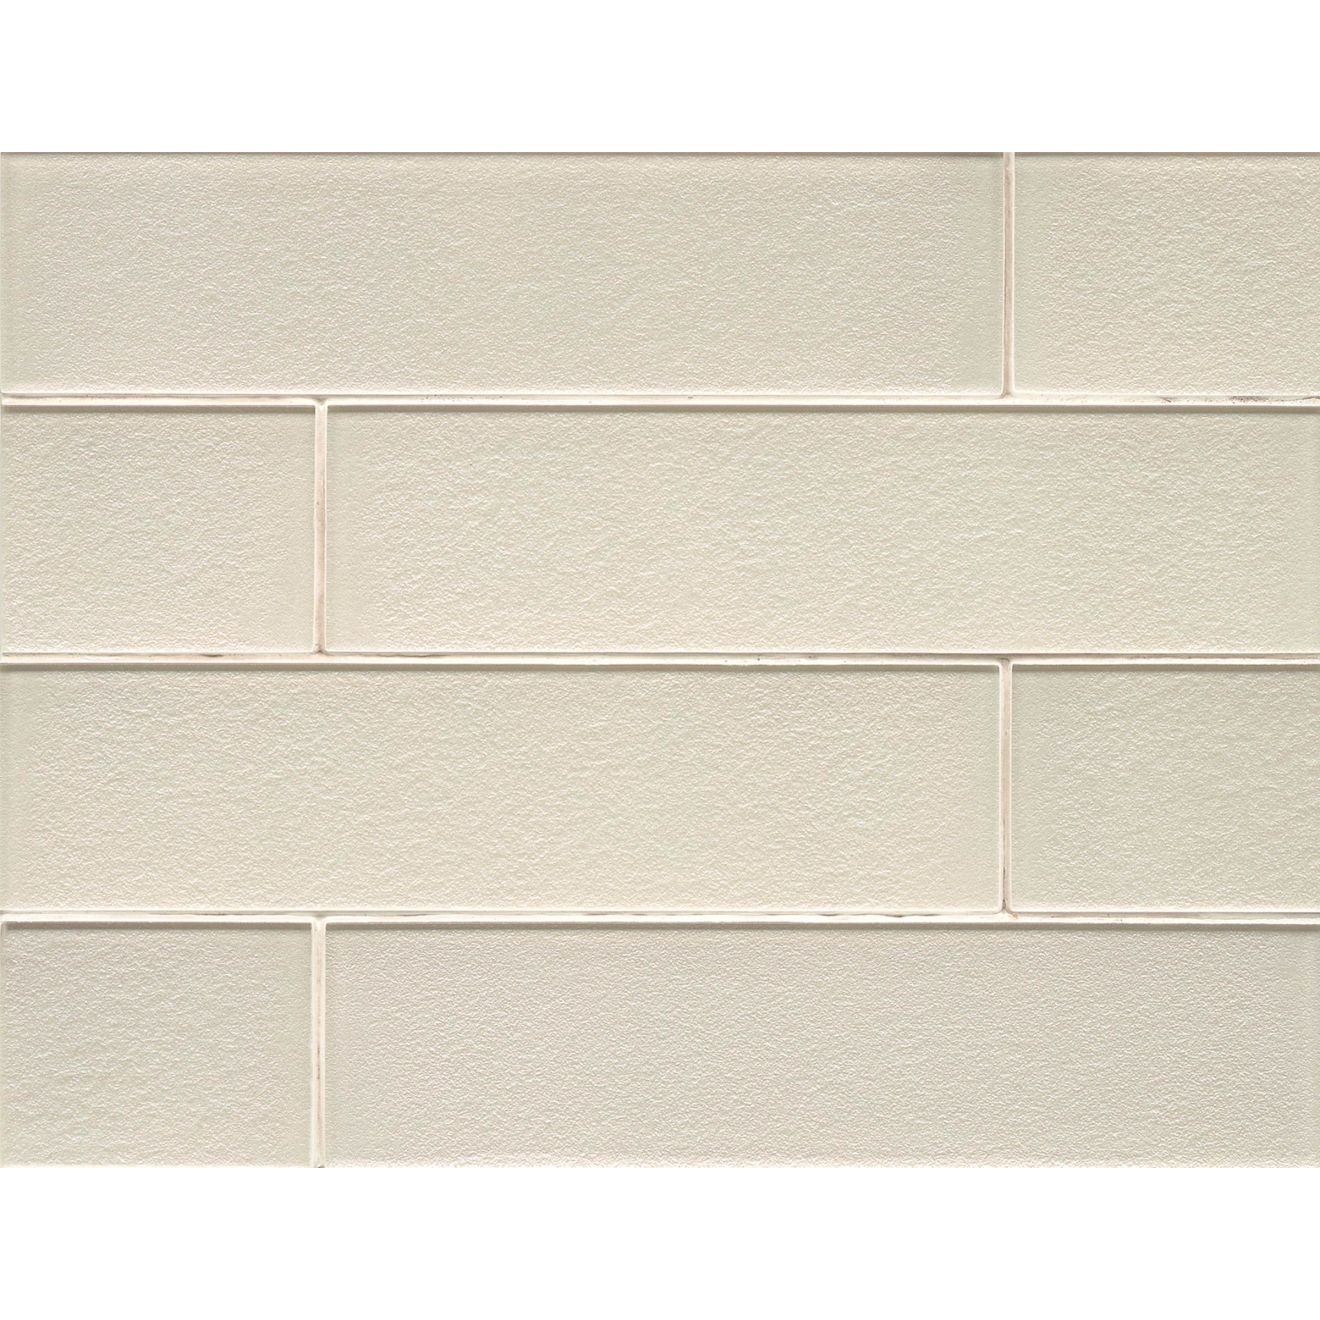 "Manhattan 4"" x 16"" Wall Tile in Pearl"